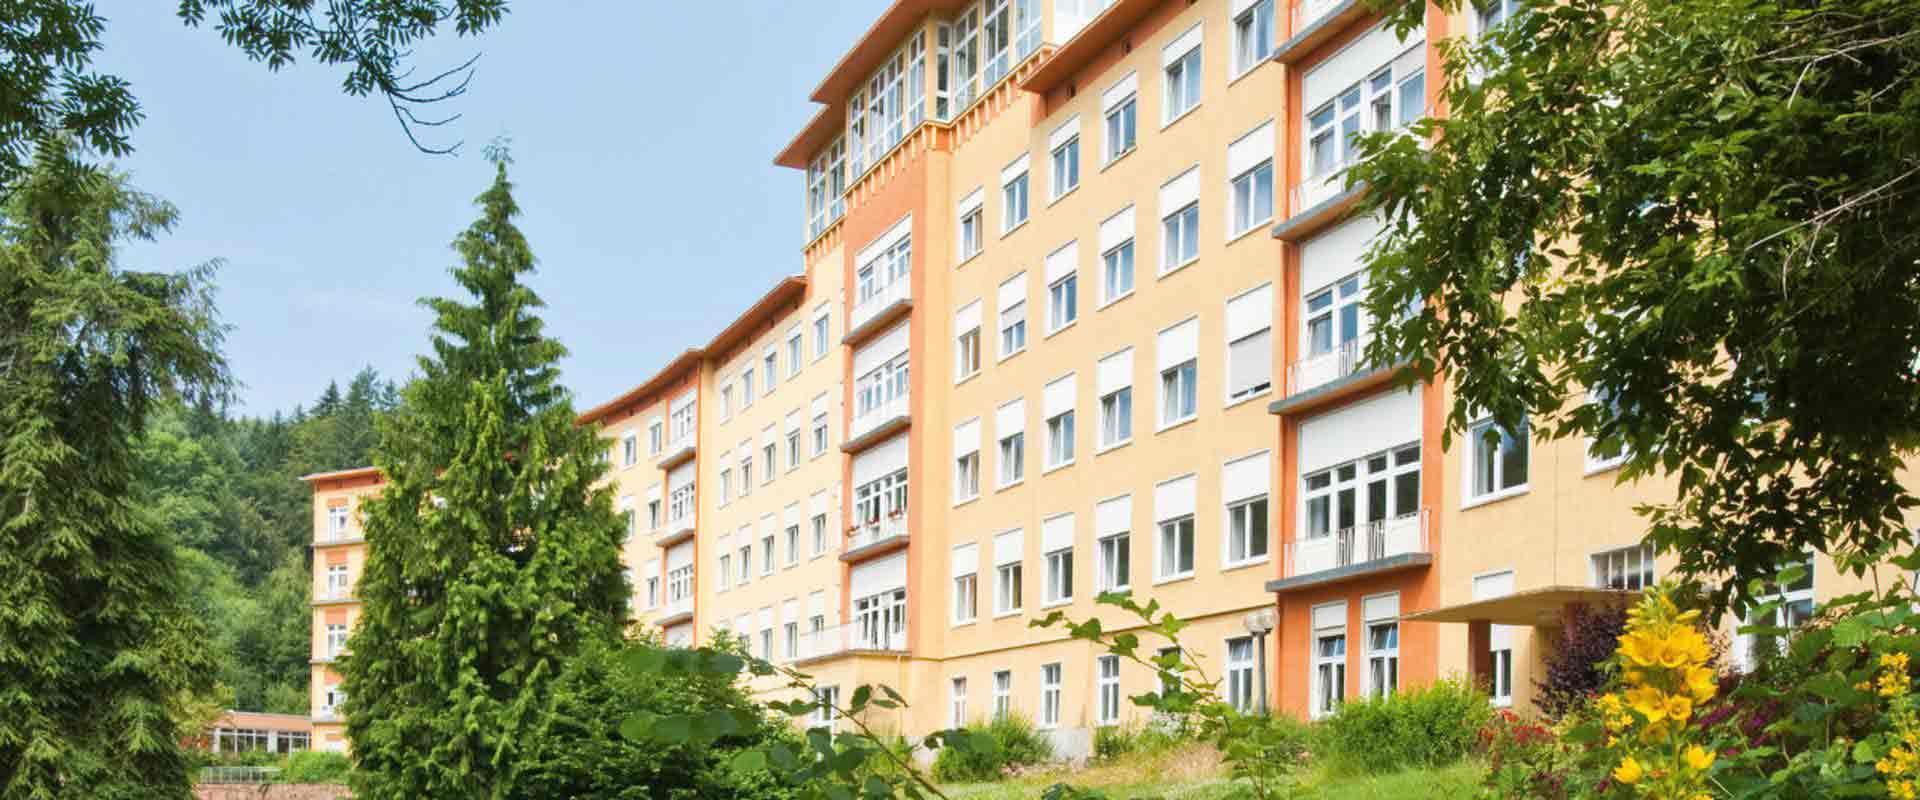 Fassade der MEDIAN Klinik Odenwald - Fachkrankenhaus